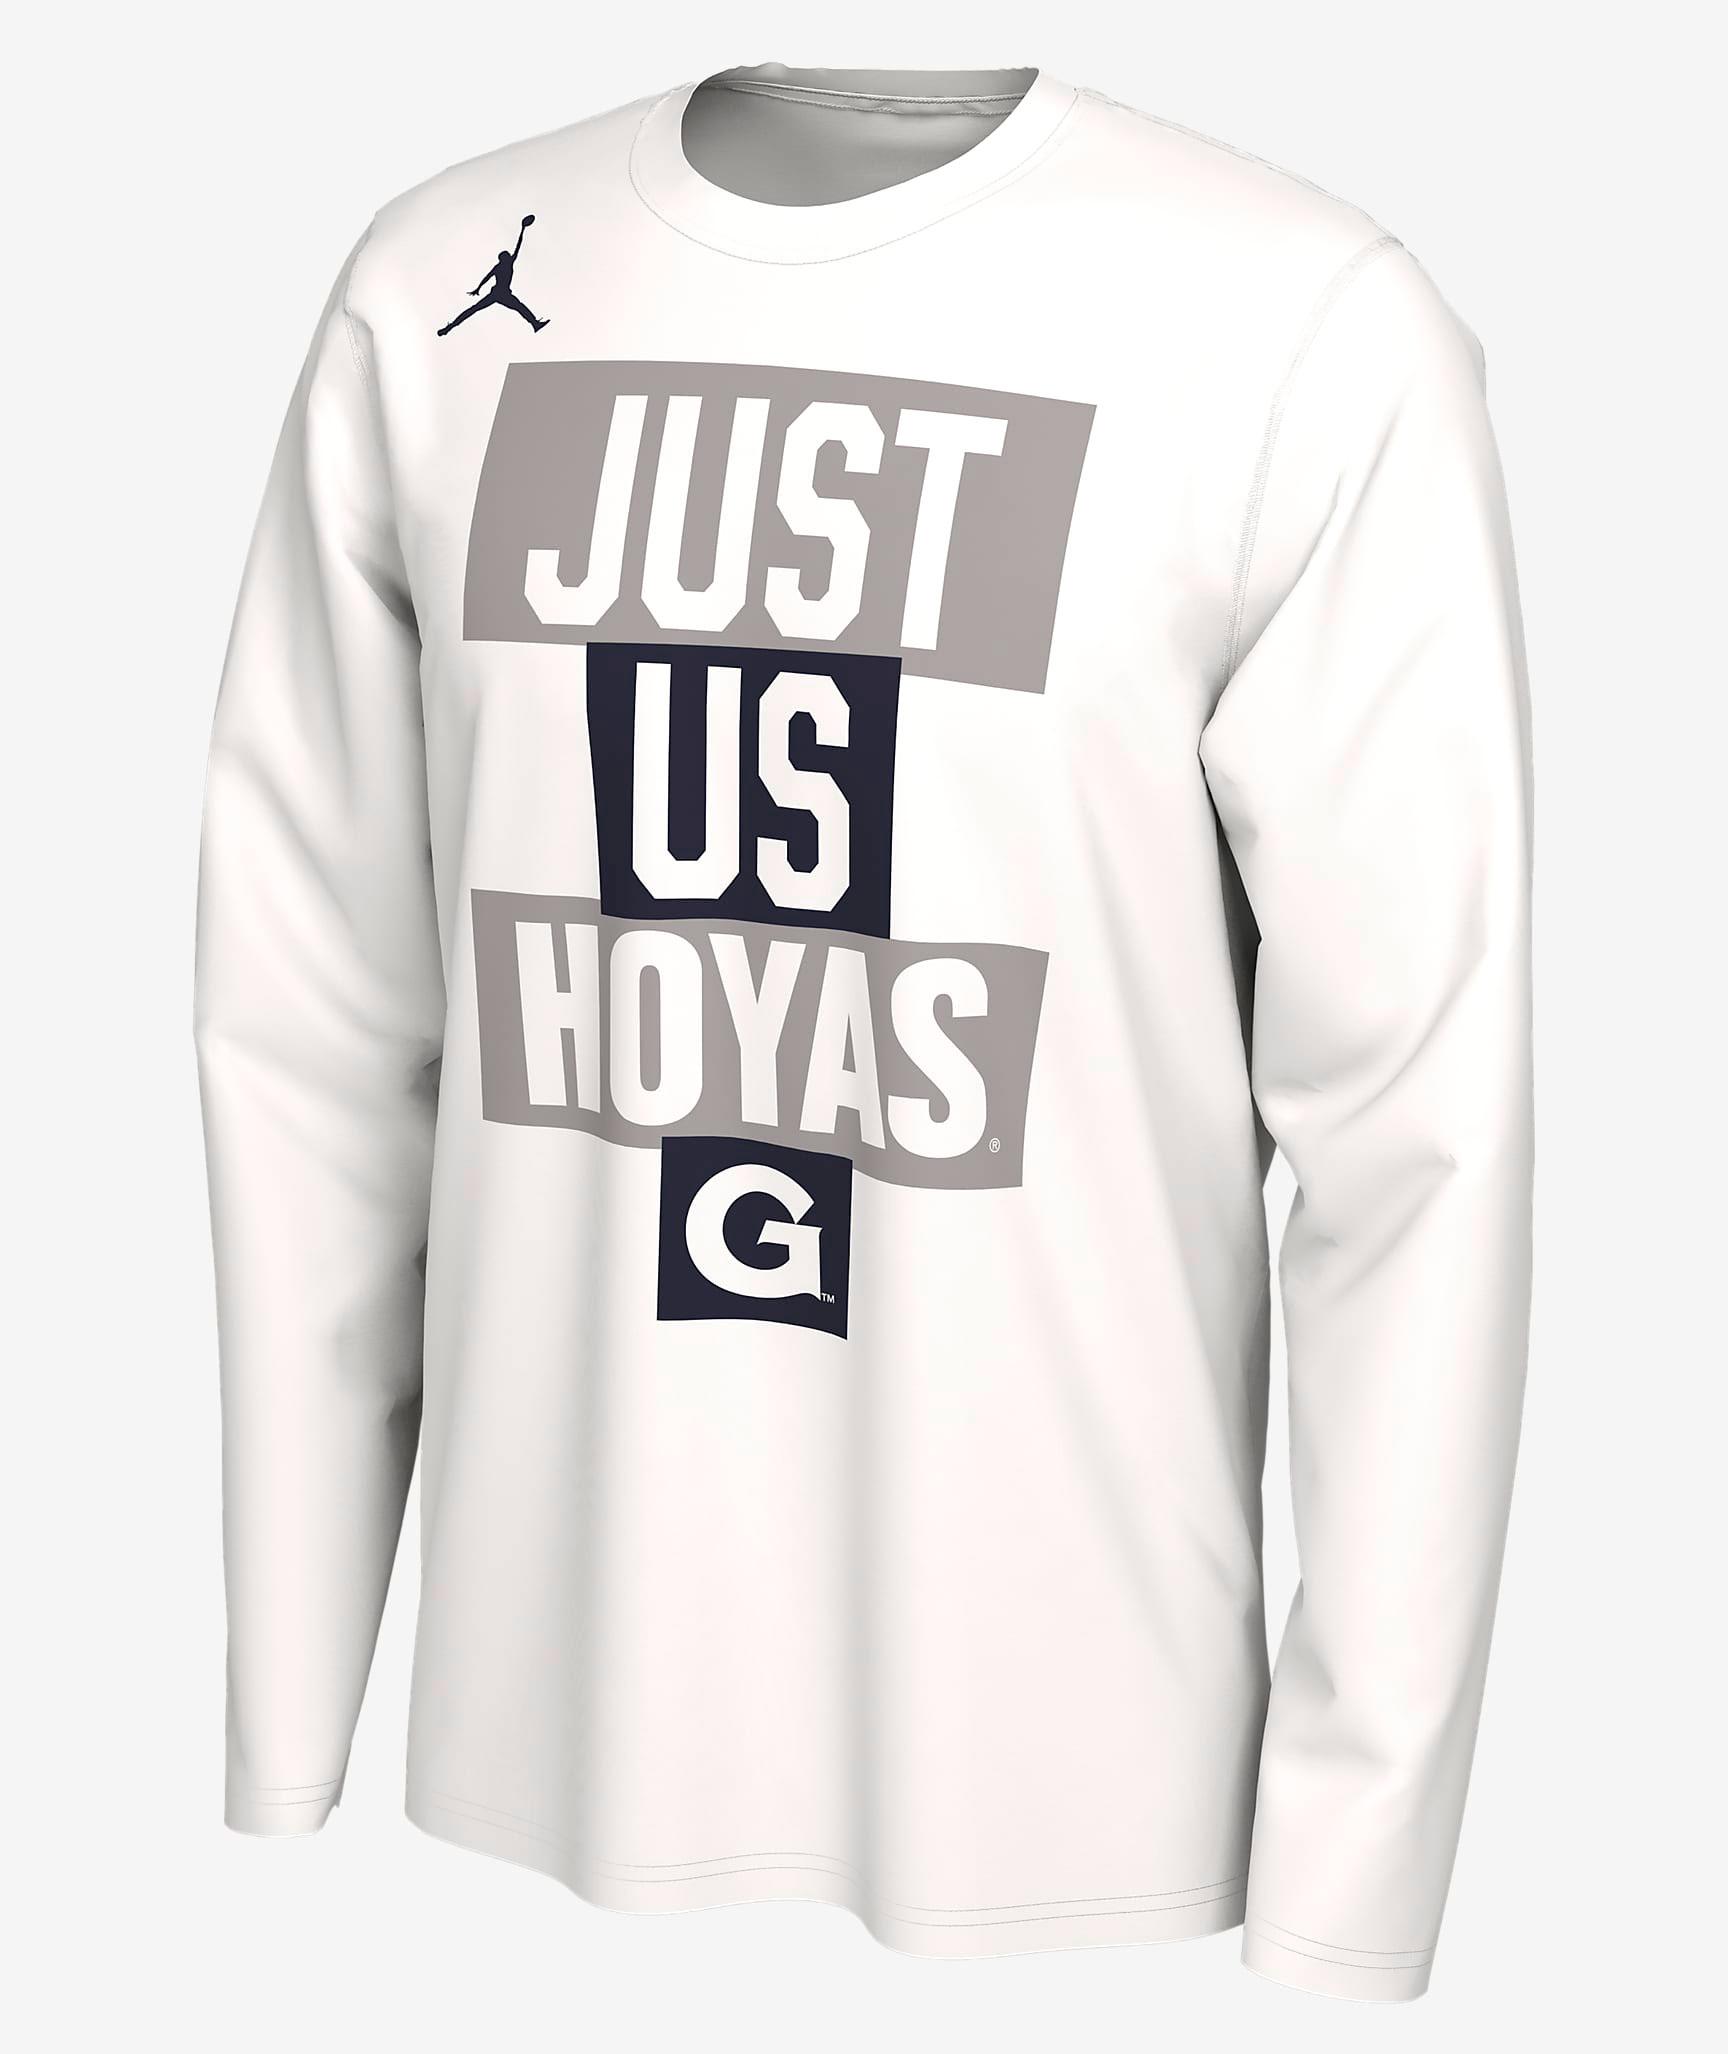 jordan-georgetown-hoyas-just-us-shirt